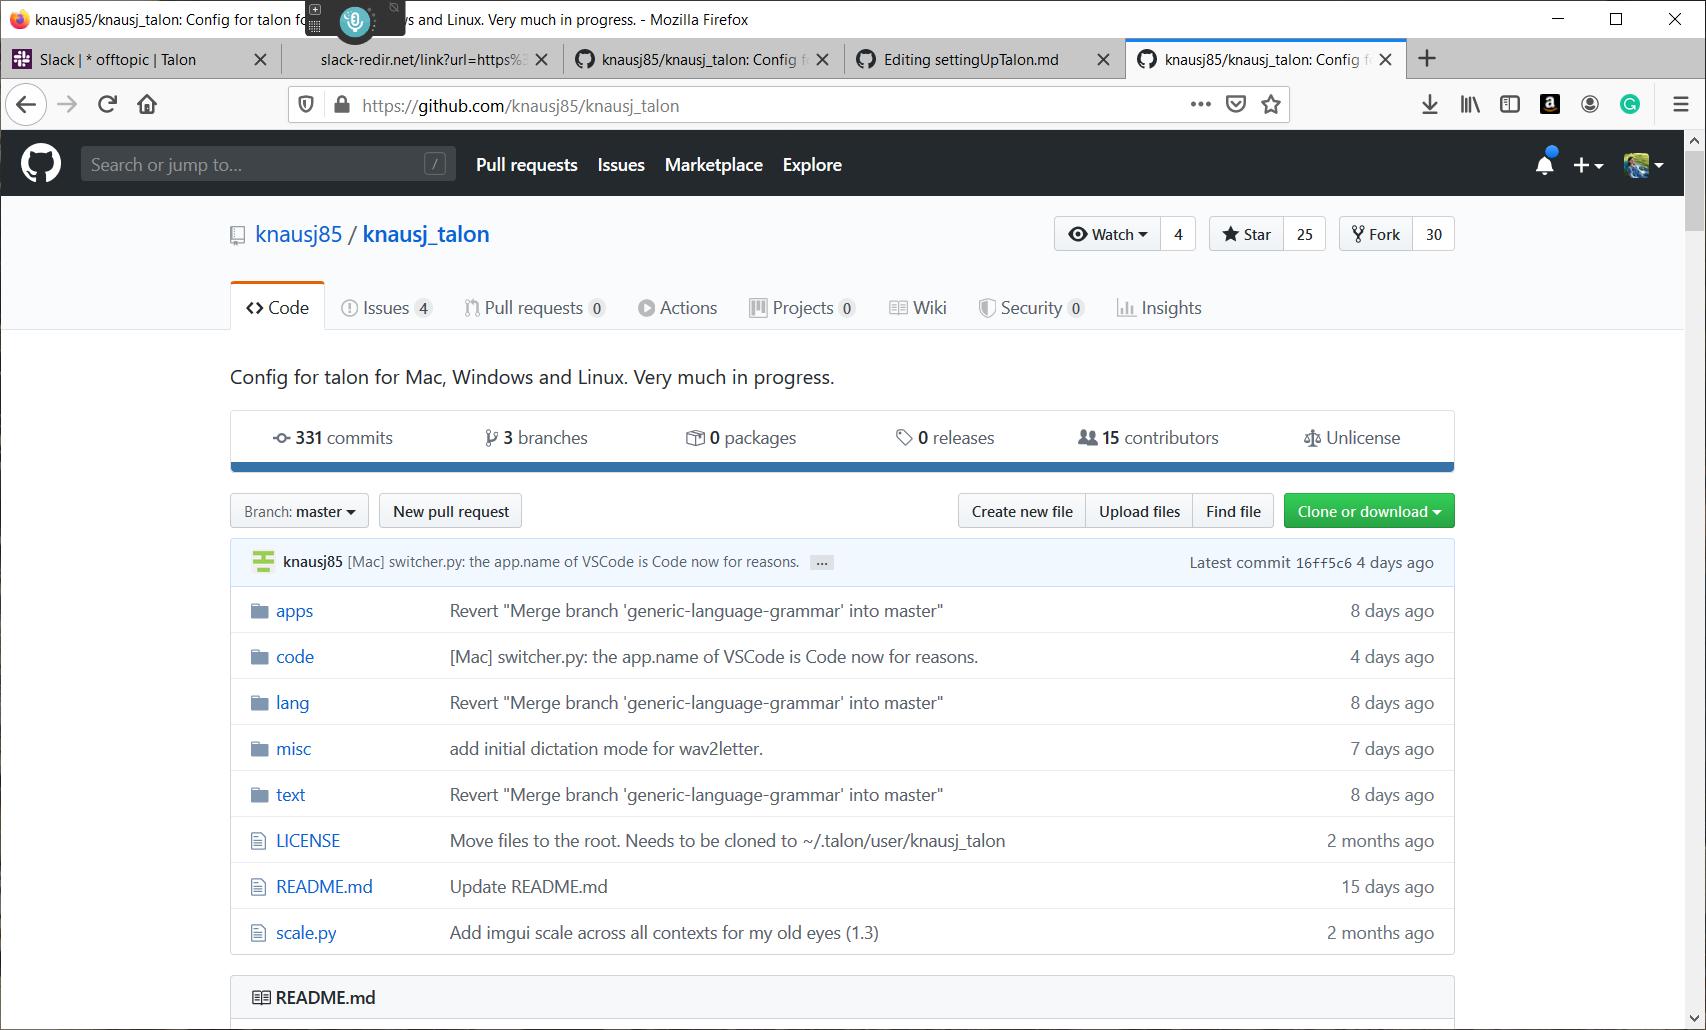 knausj_talon configuration files github page